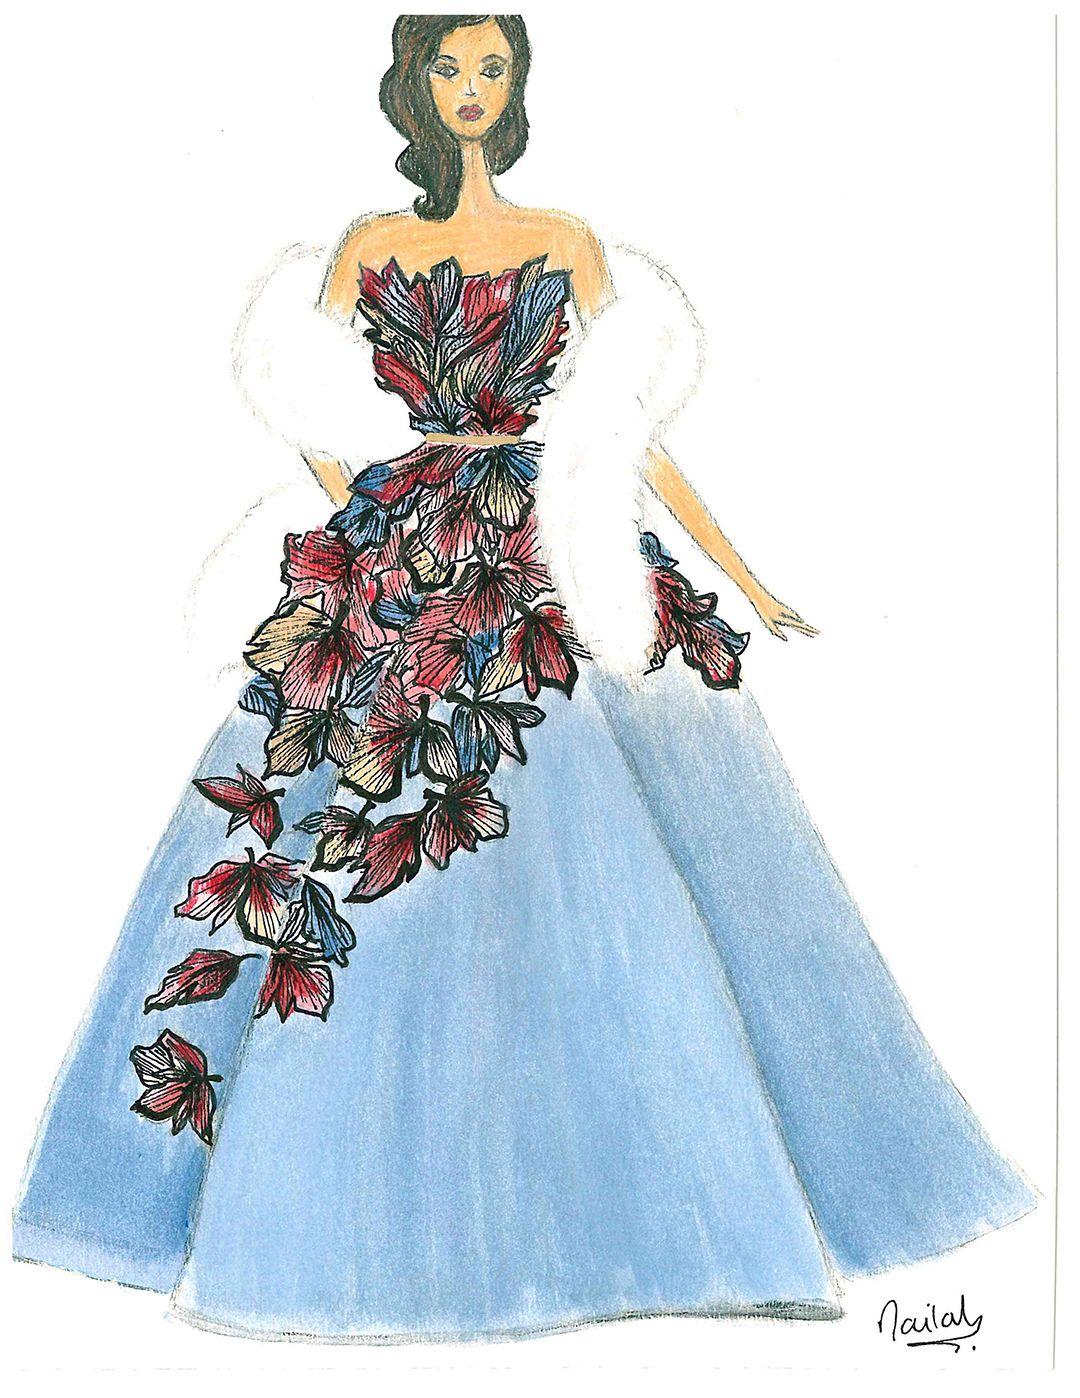 Illustration Of An Original Garment Design